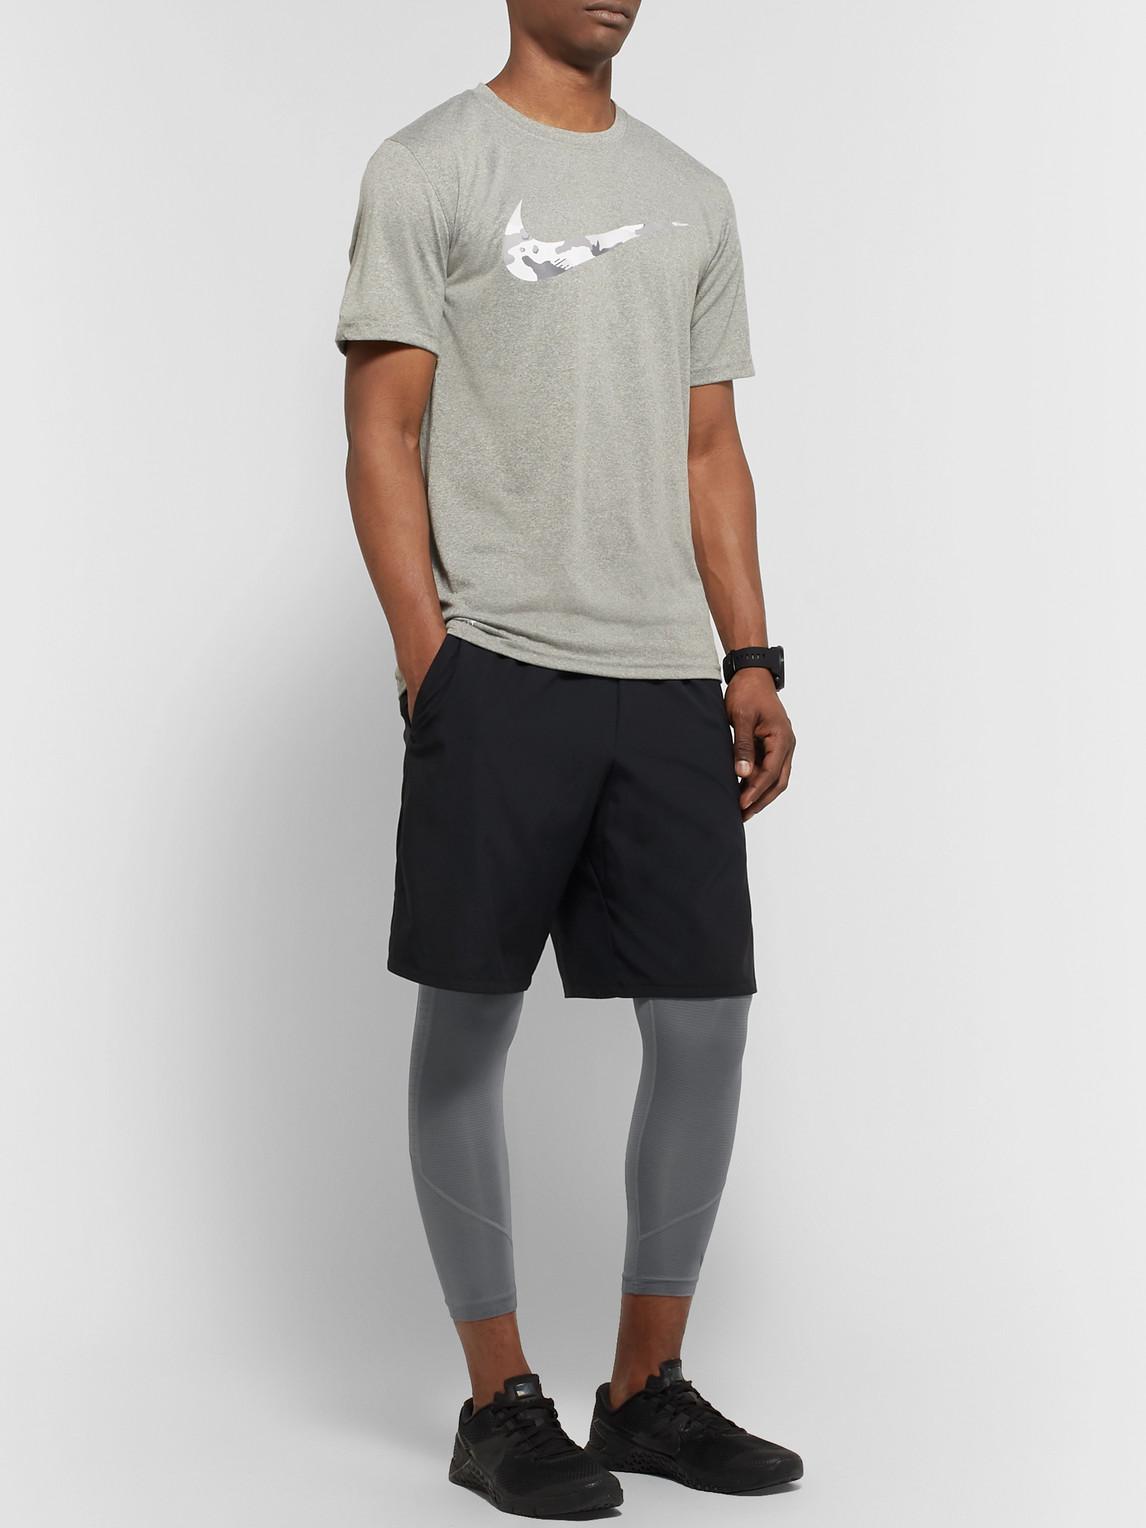 Nike Tops PRO STRETCH